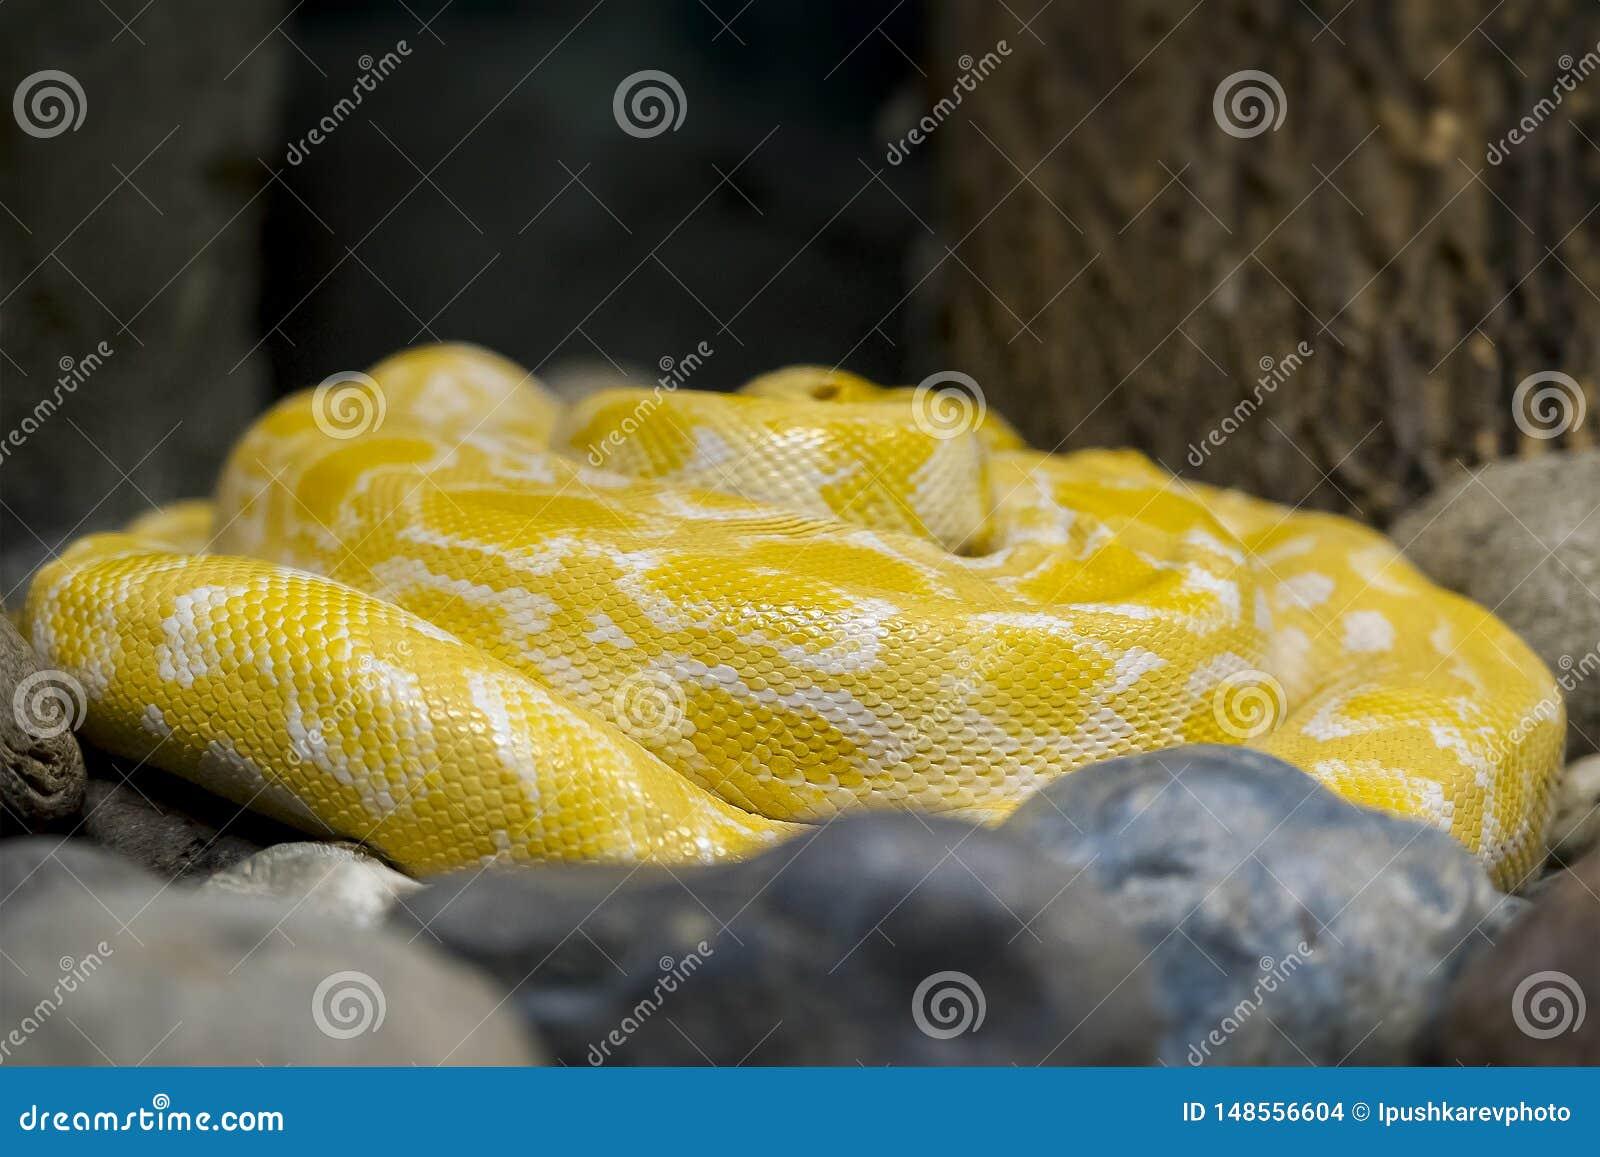 Albino Burmese Python Python molurus bivittatus. Golden yellow snake lying on ground